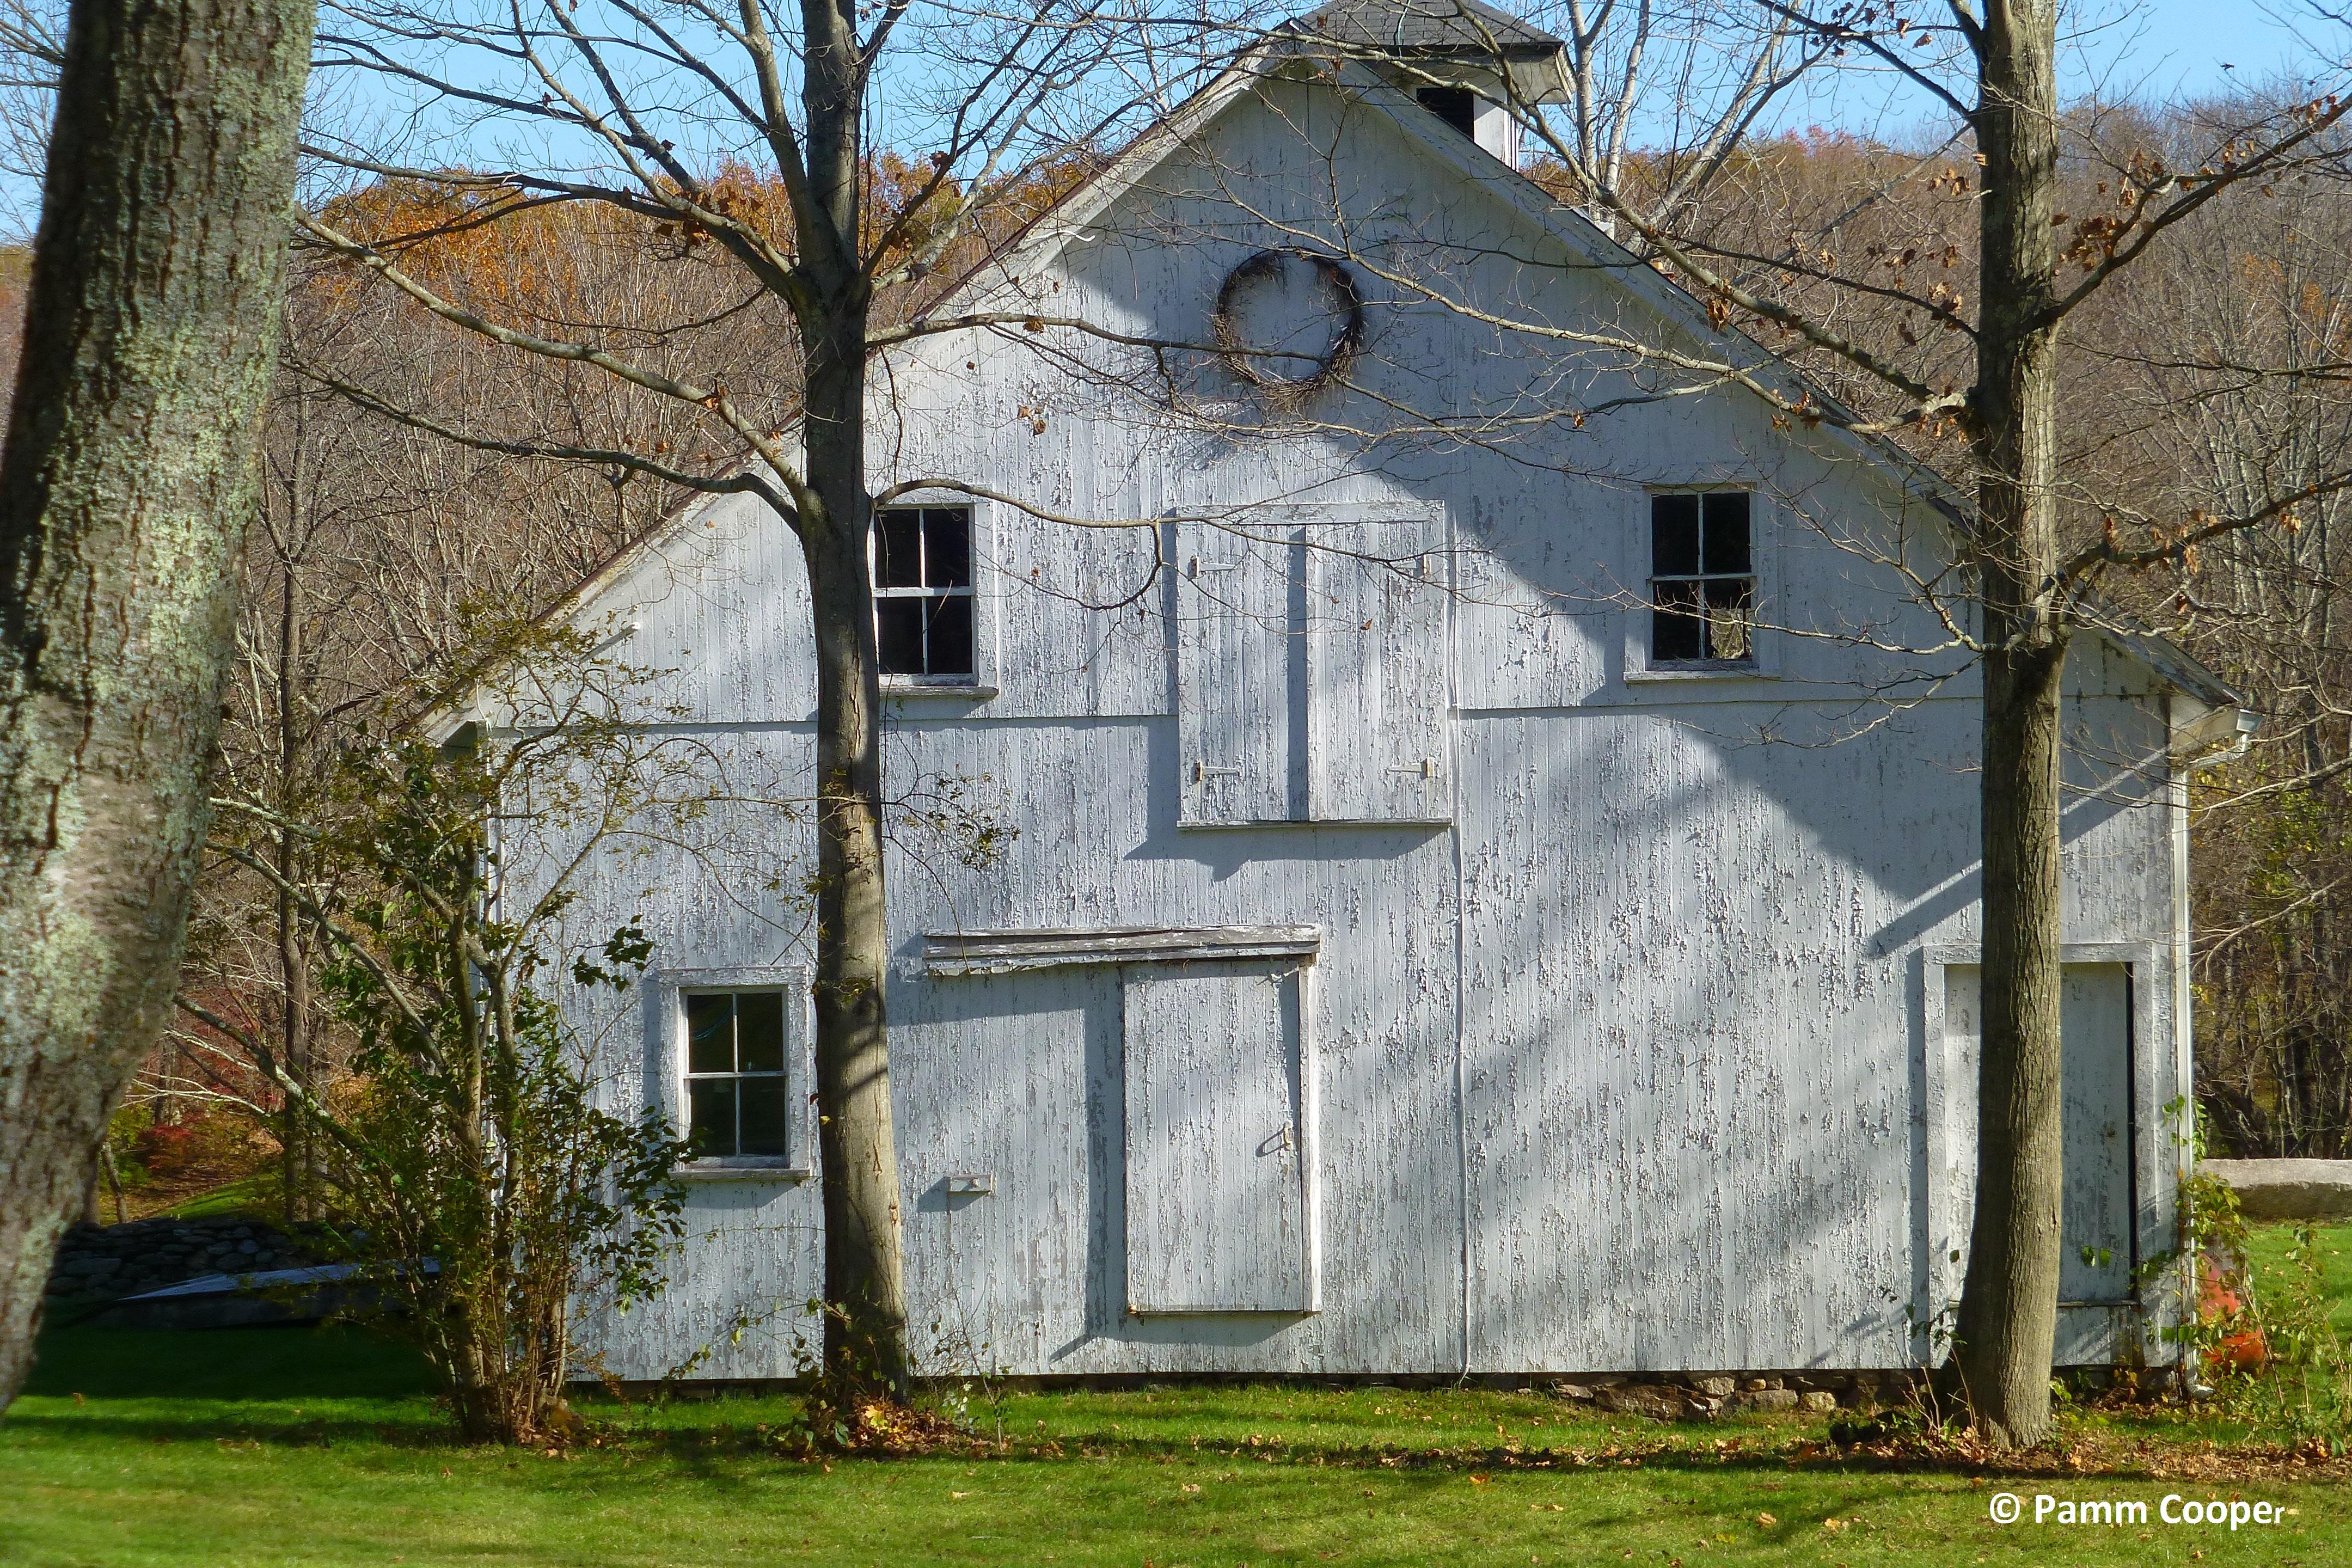 Sheridan Homestead barn Bolton ct. gentlemans barn style built 1900